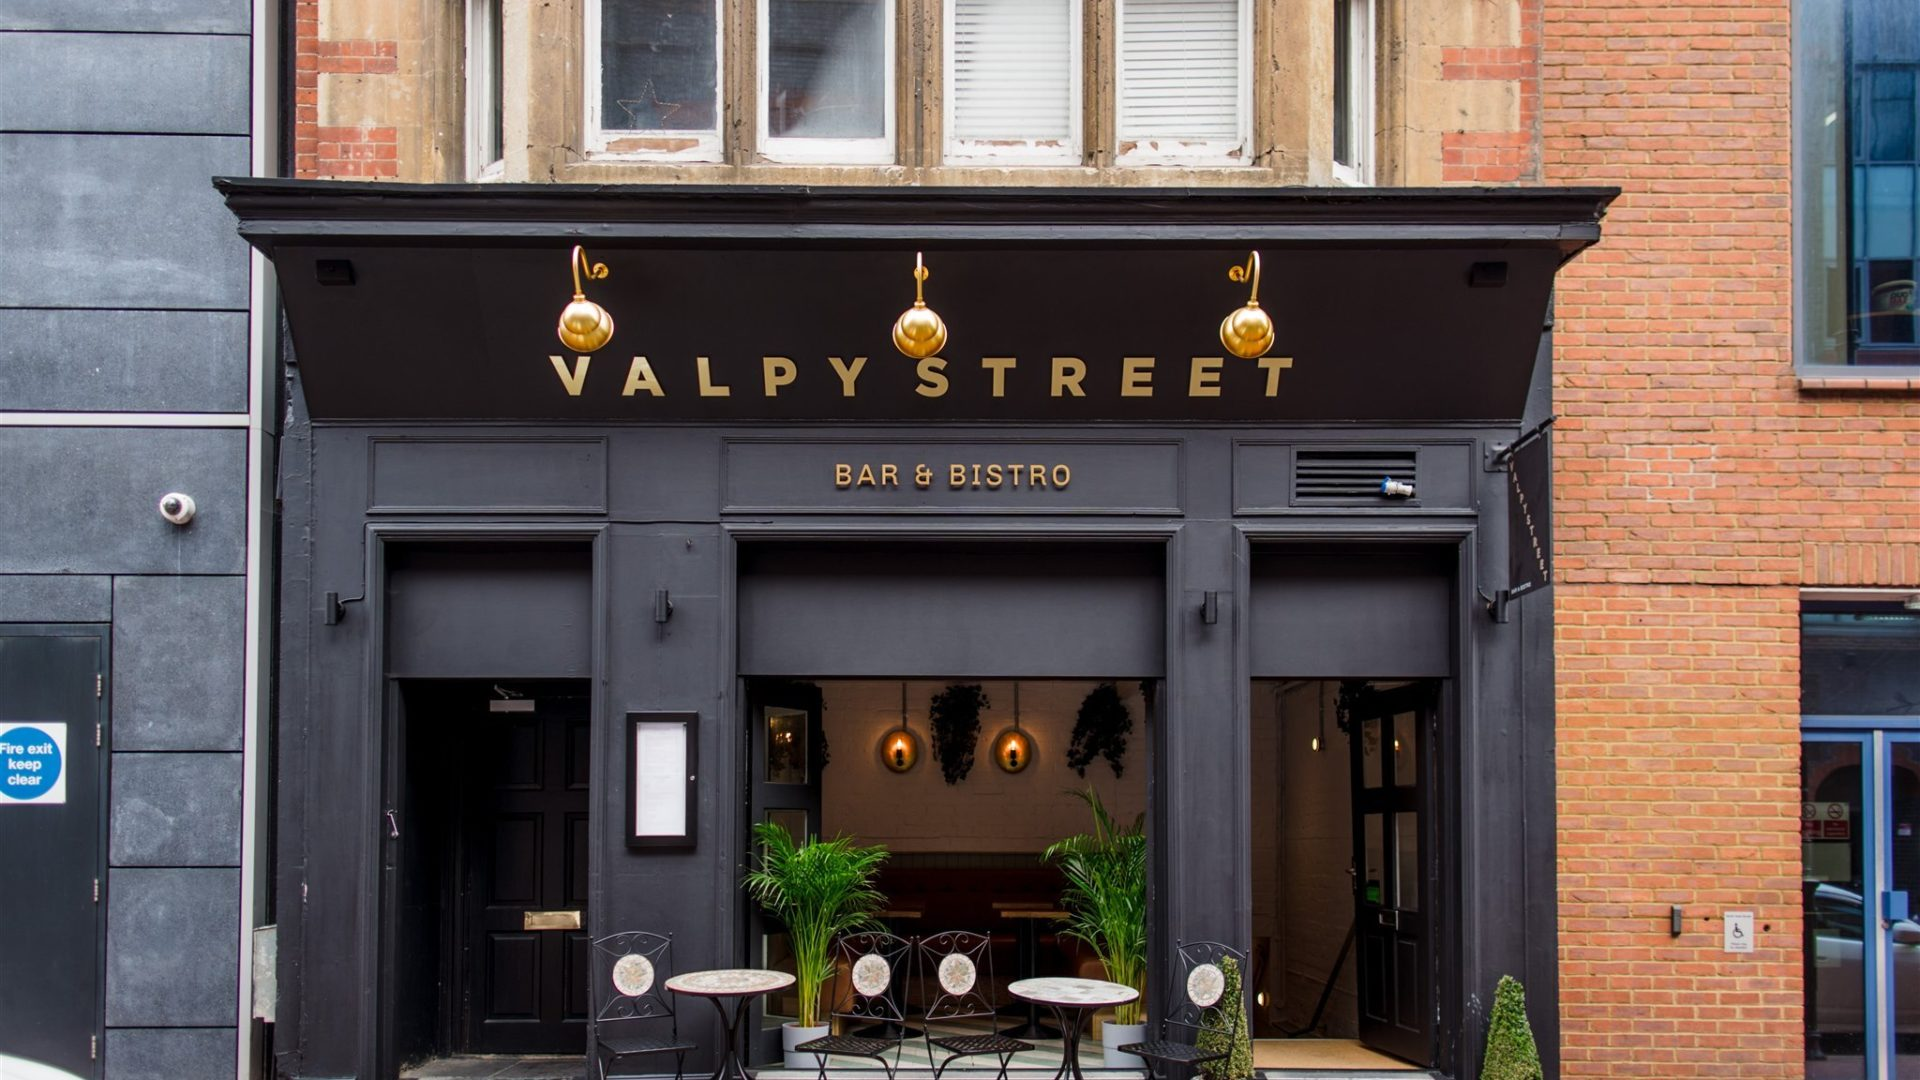 Valpy Street